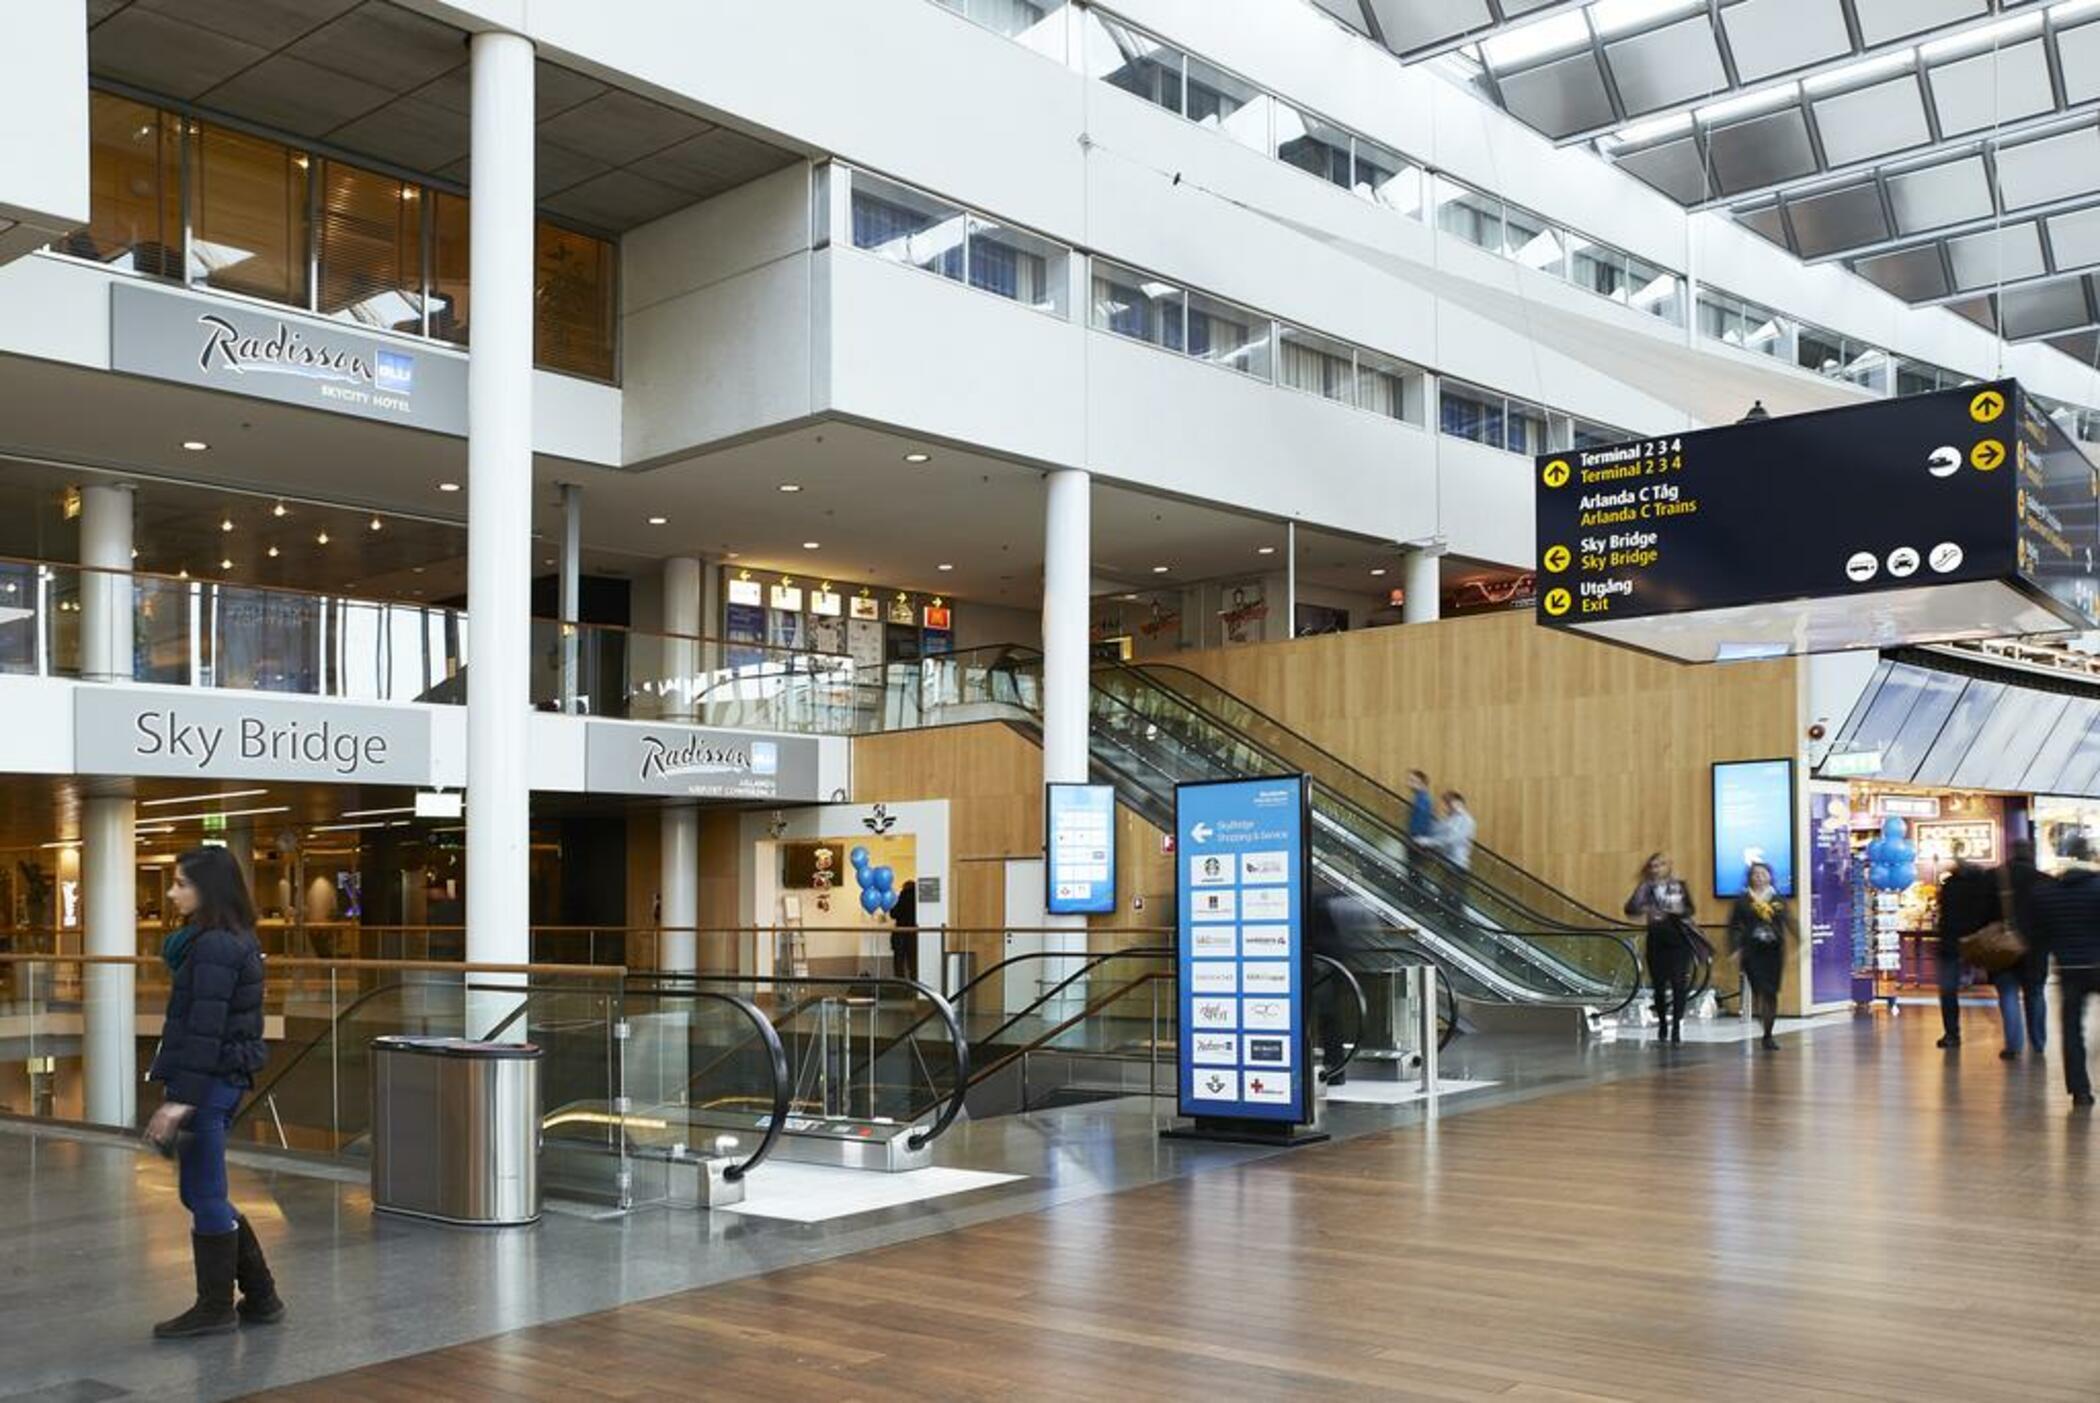 Radisson Blu SkyCity Hotel, Stockholm-Arlanda, Sigtuna